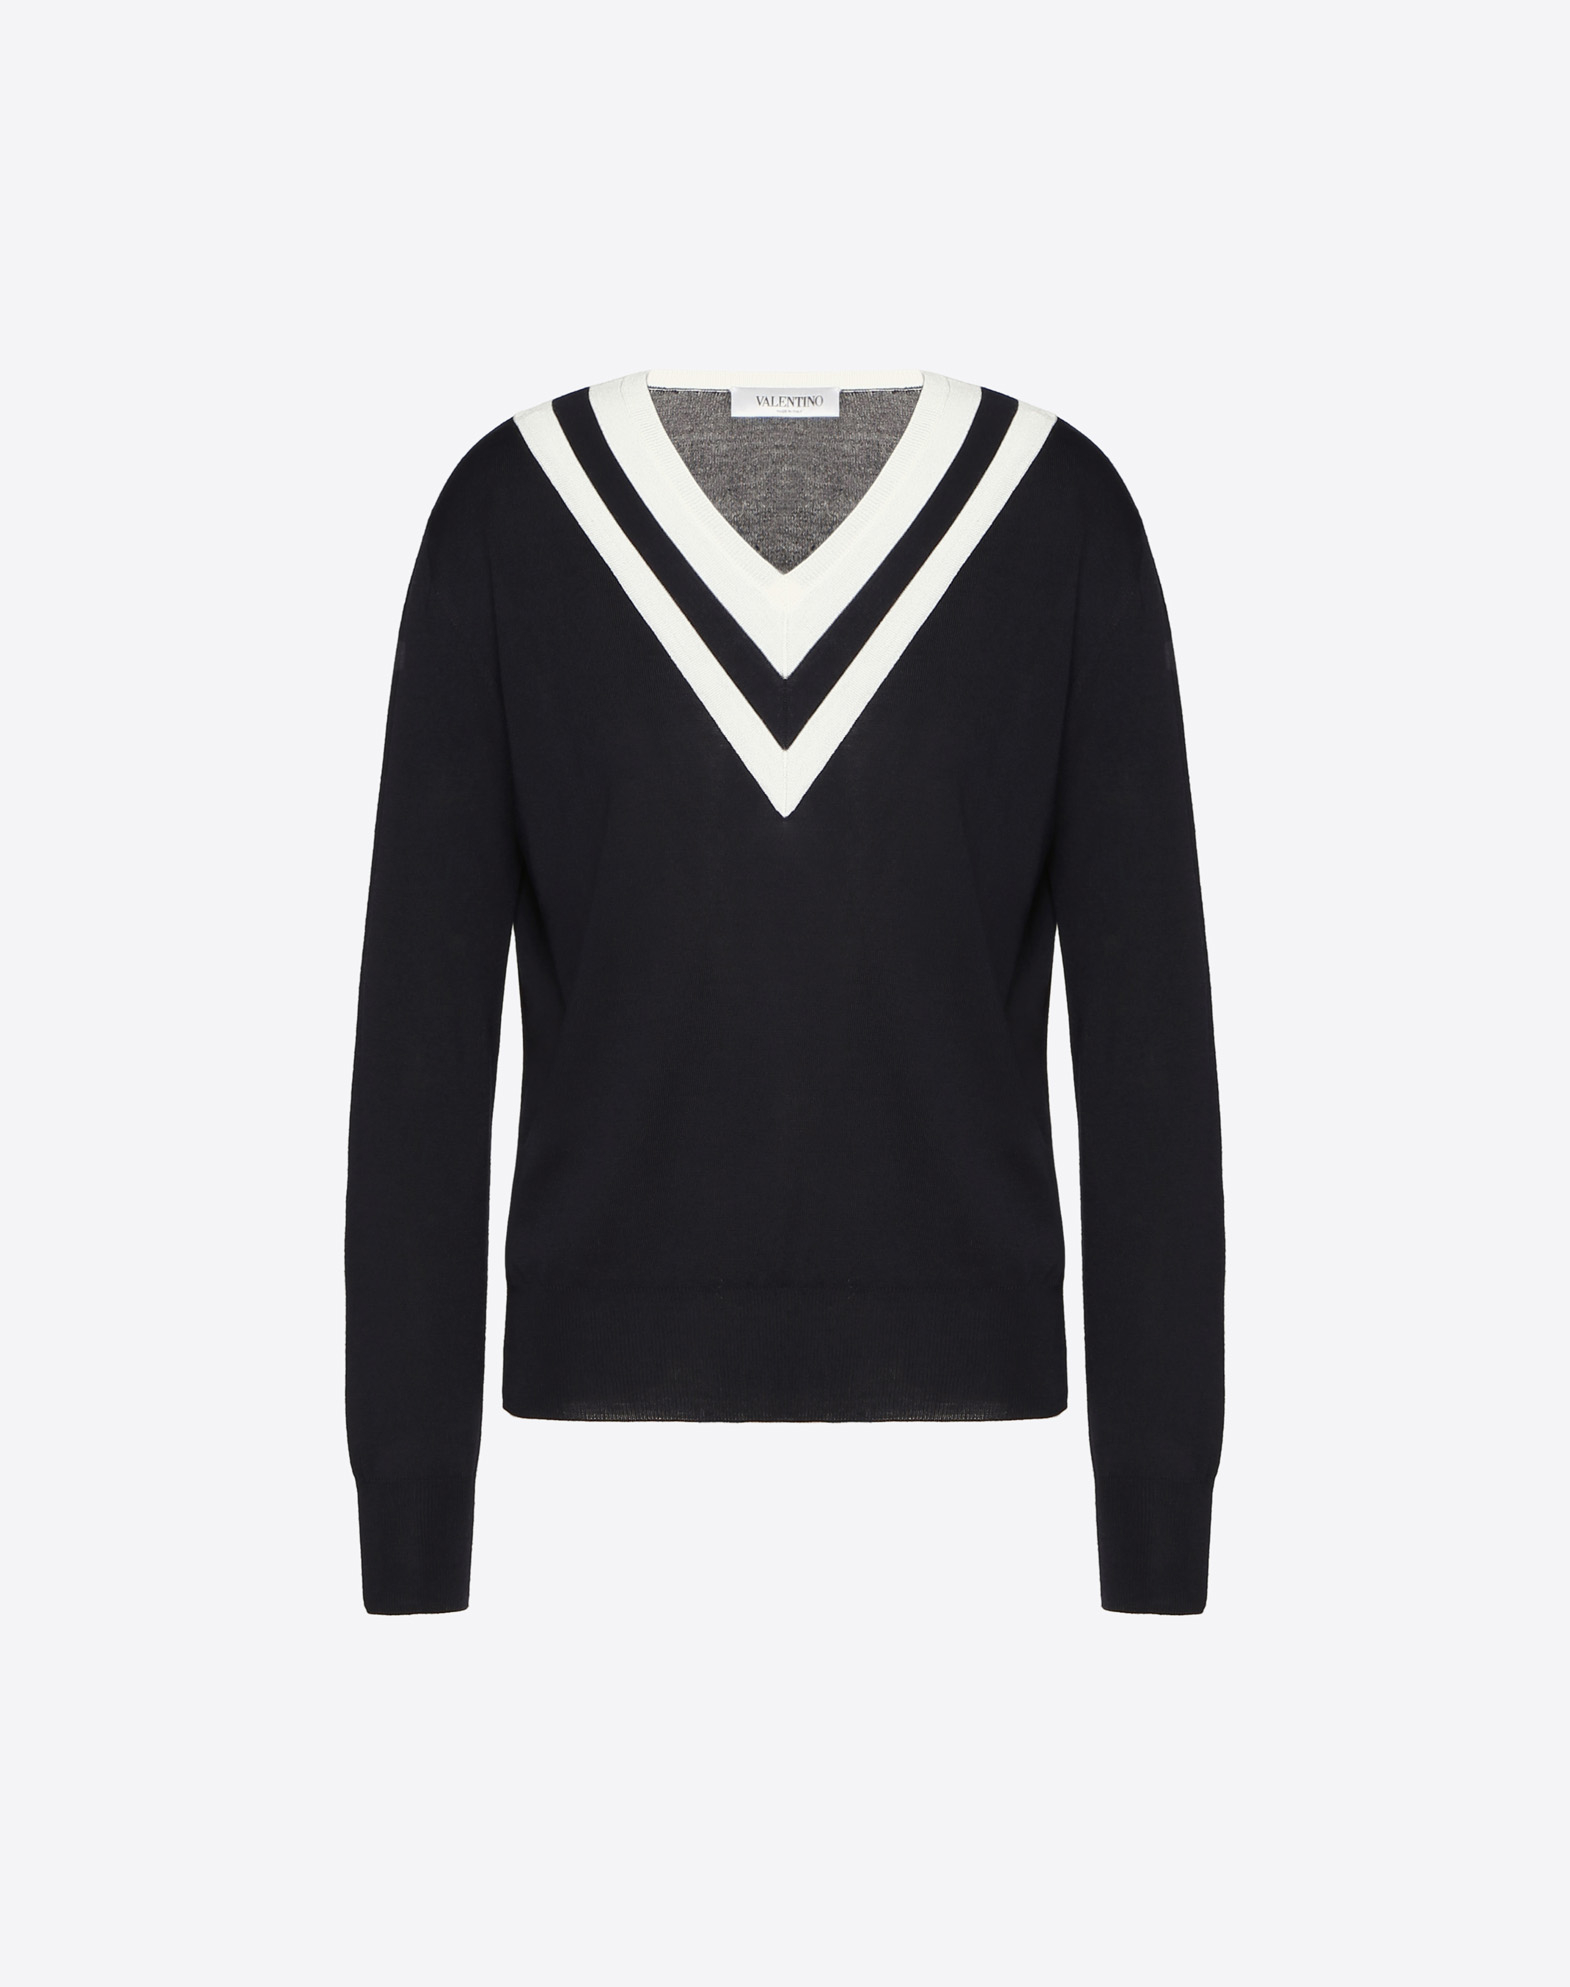 Jersey de lana con detalles en contraste